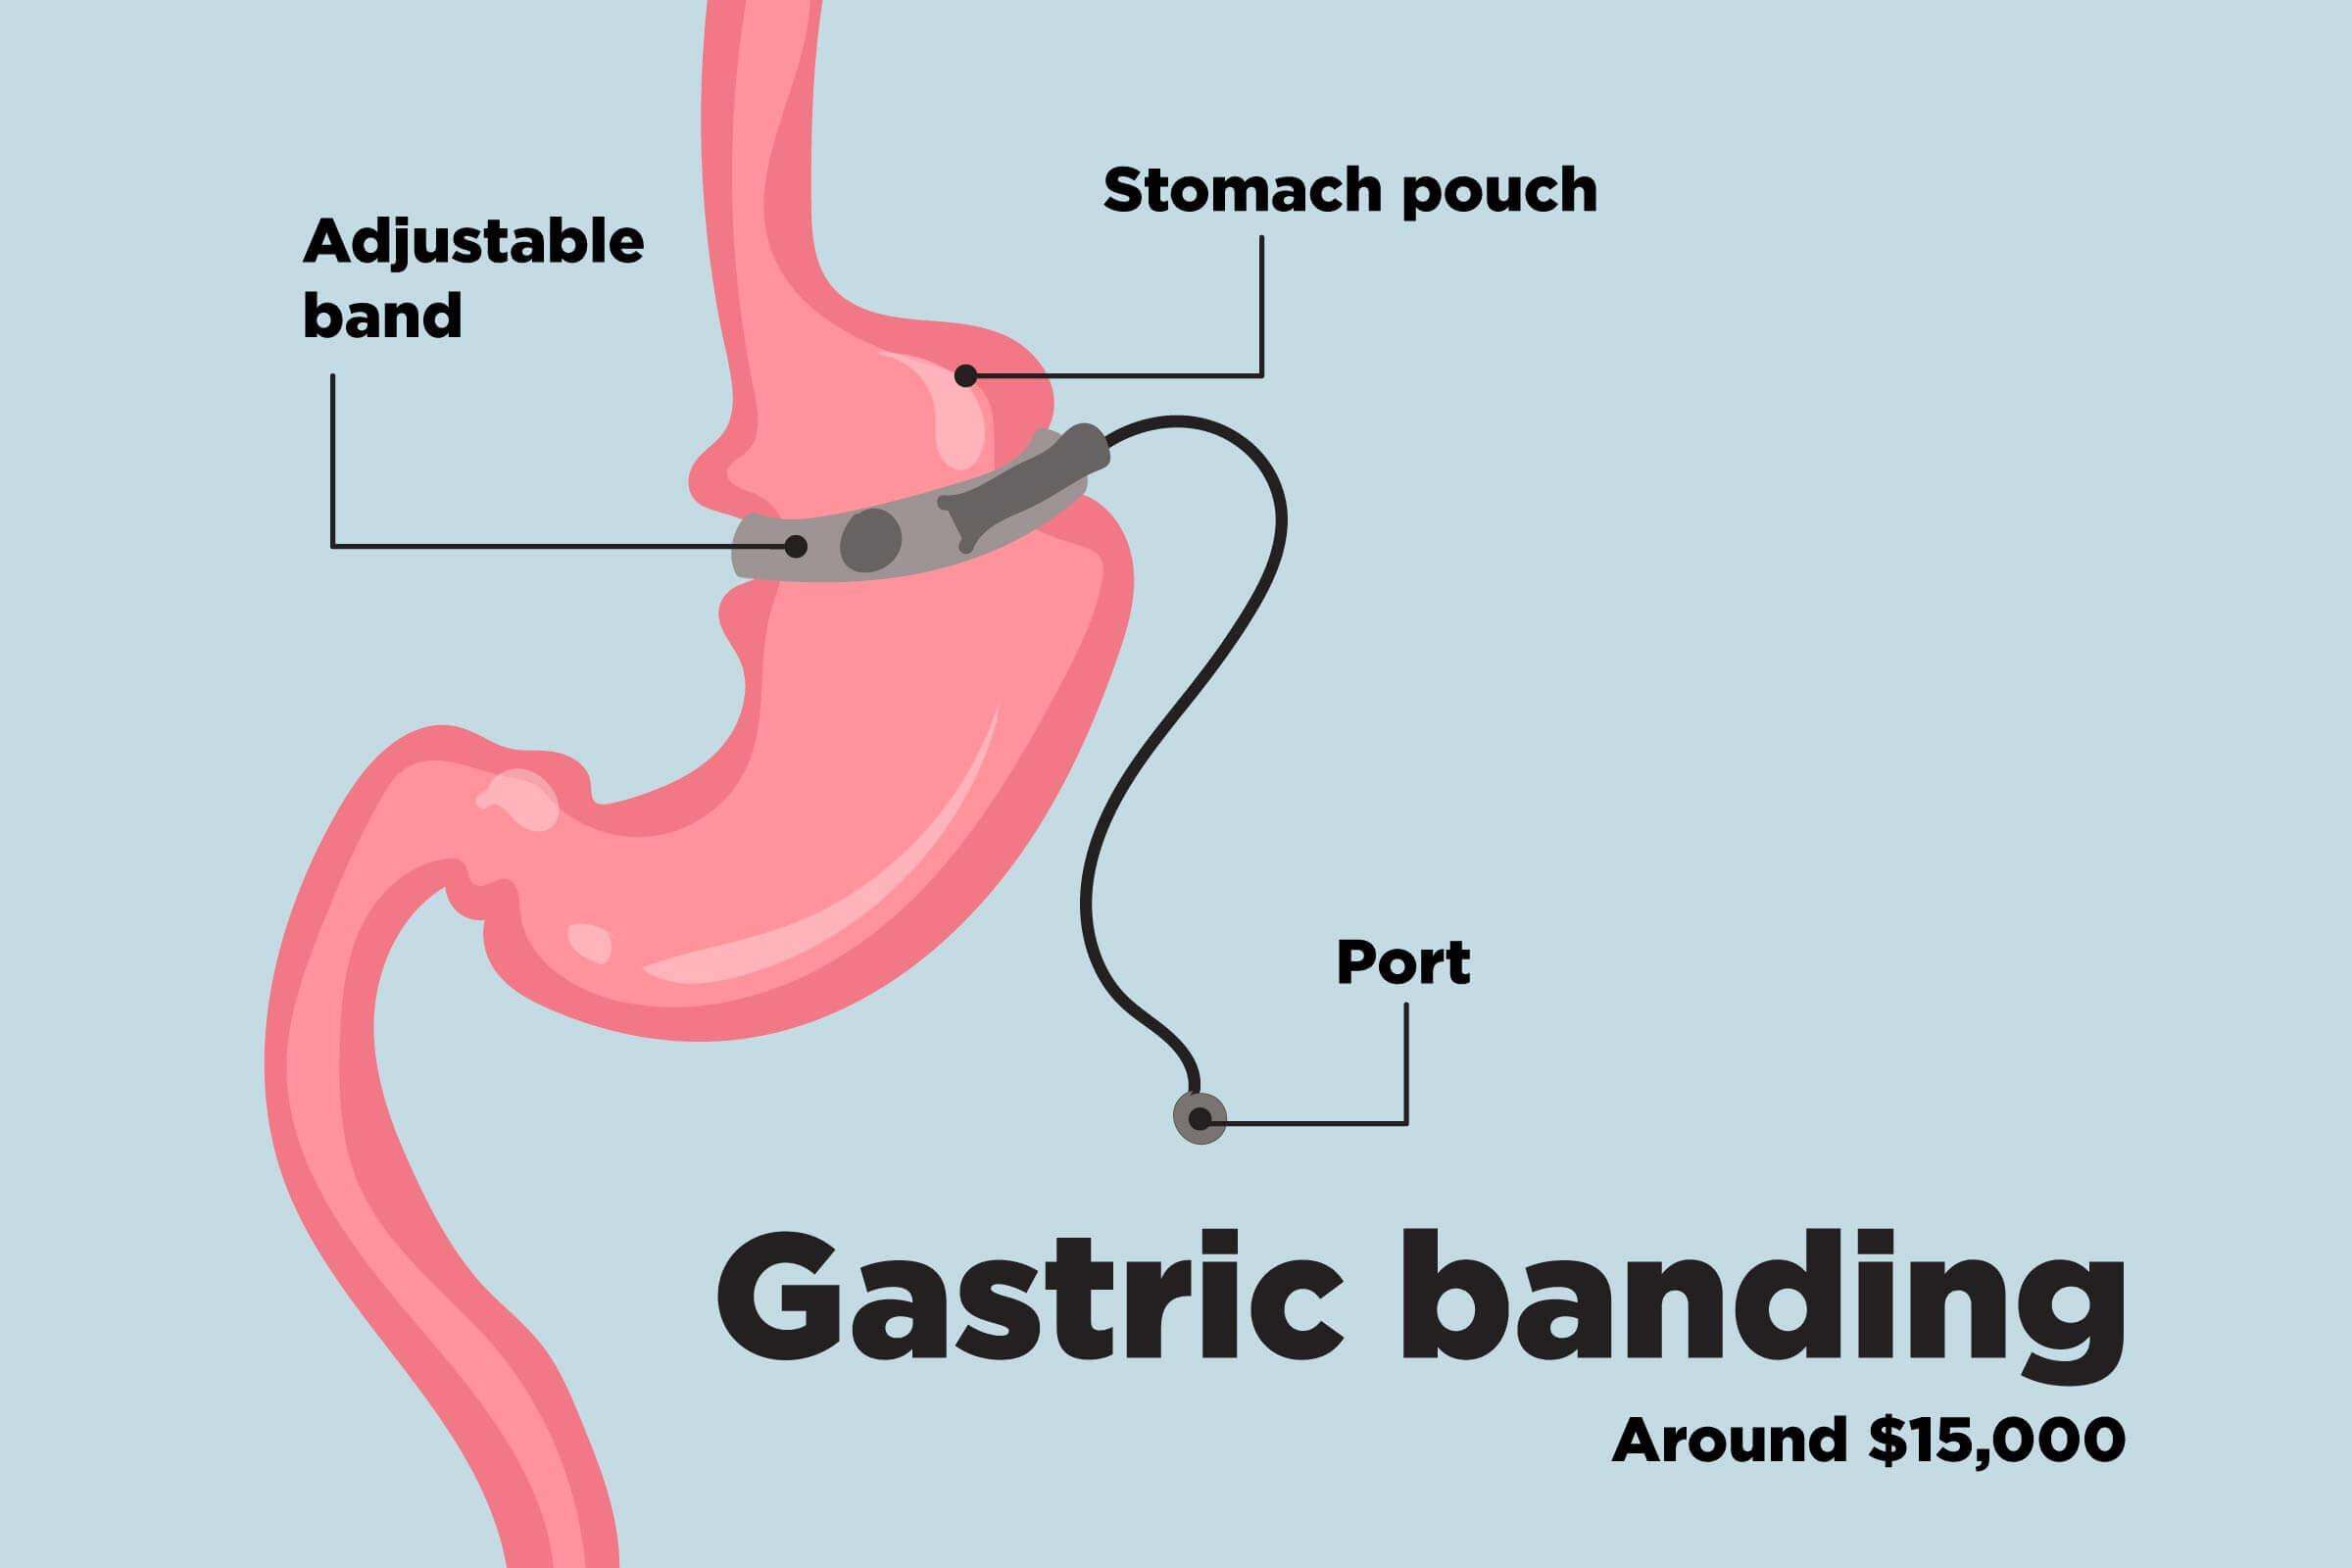 عمل باندینگ معده جراح لاغری